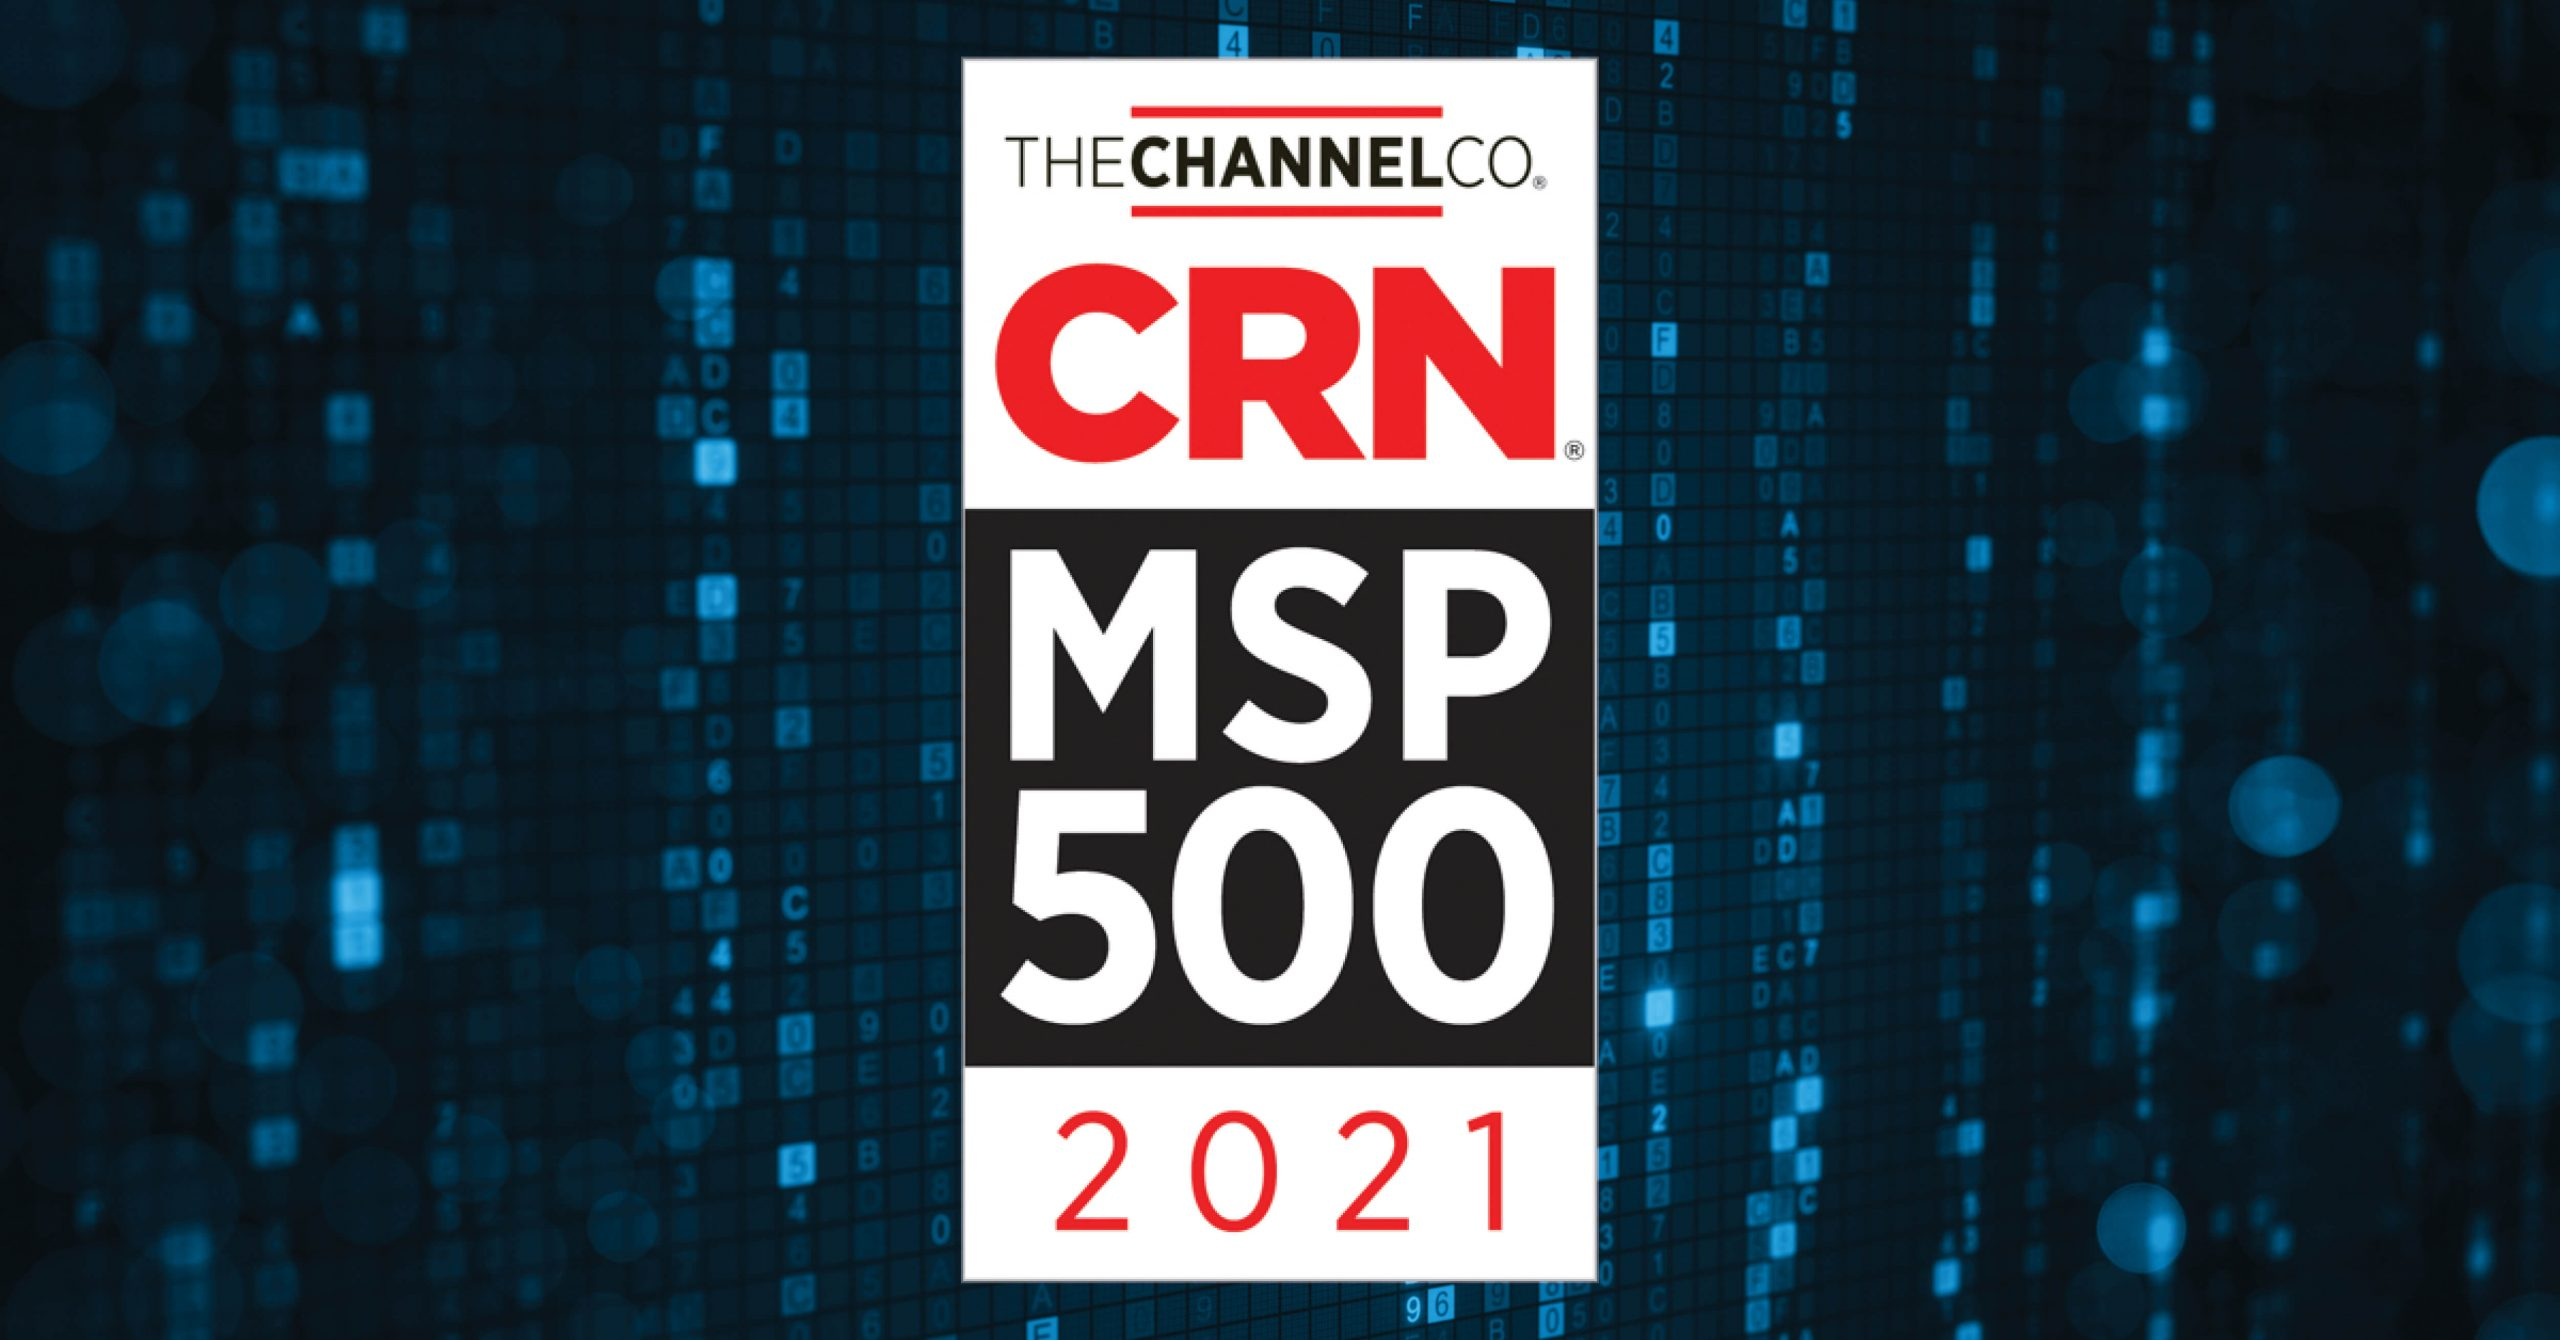 2021 CRN MSP 500 motivit